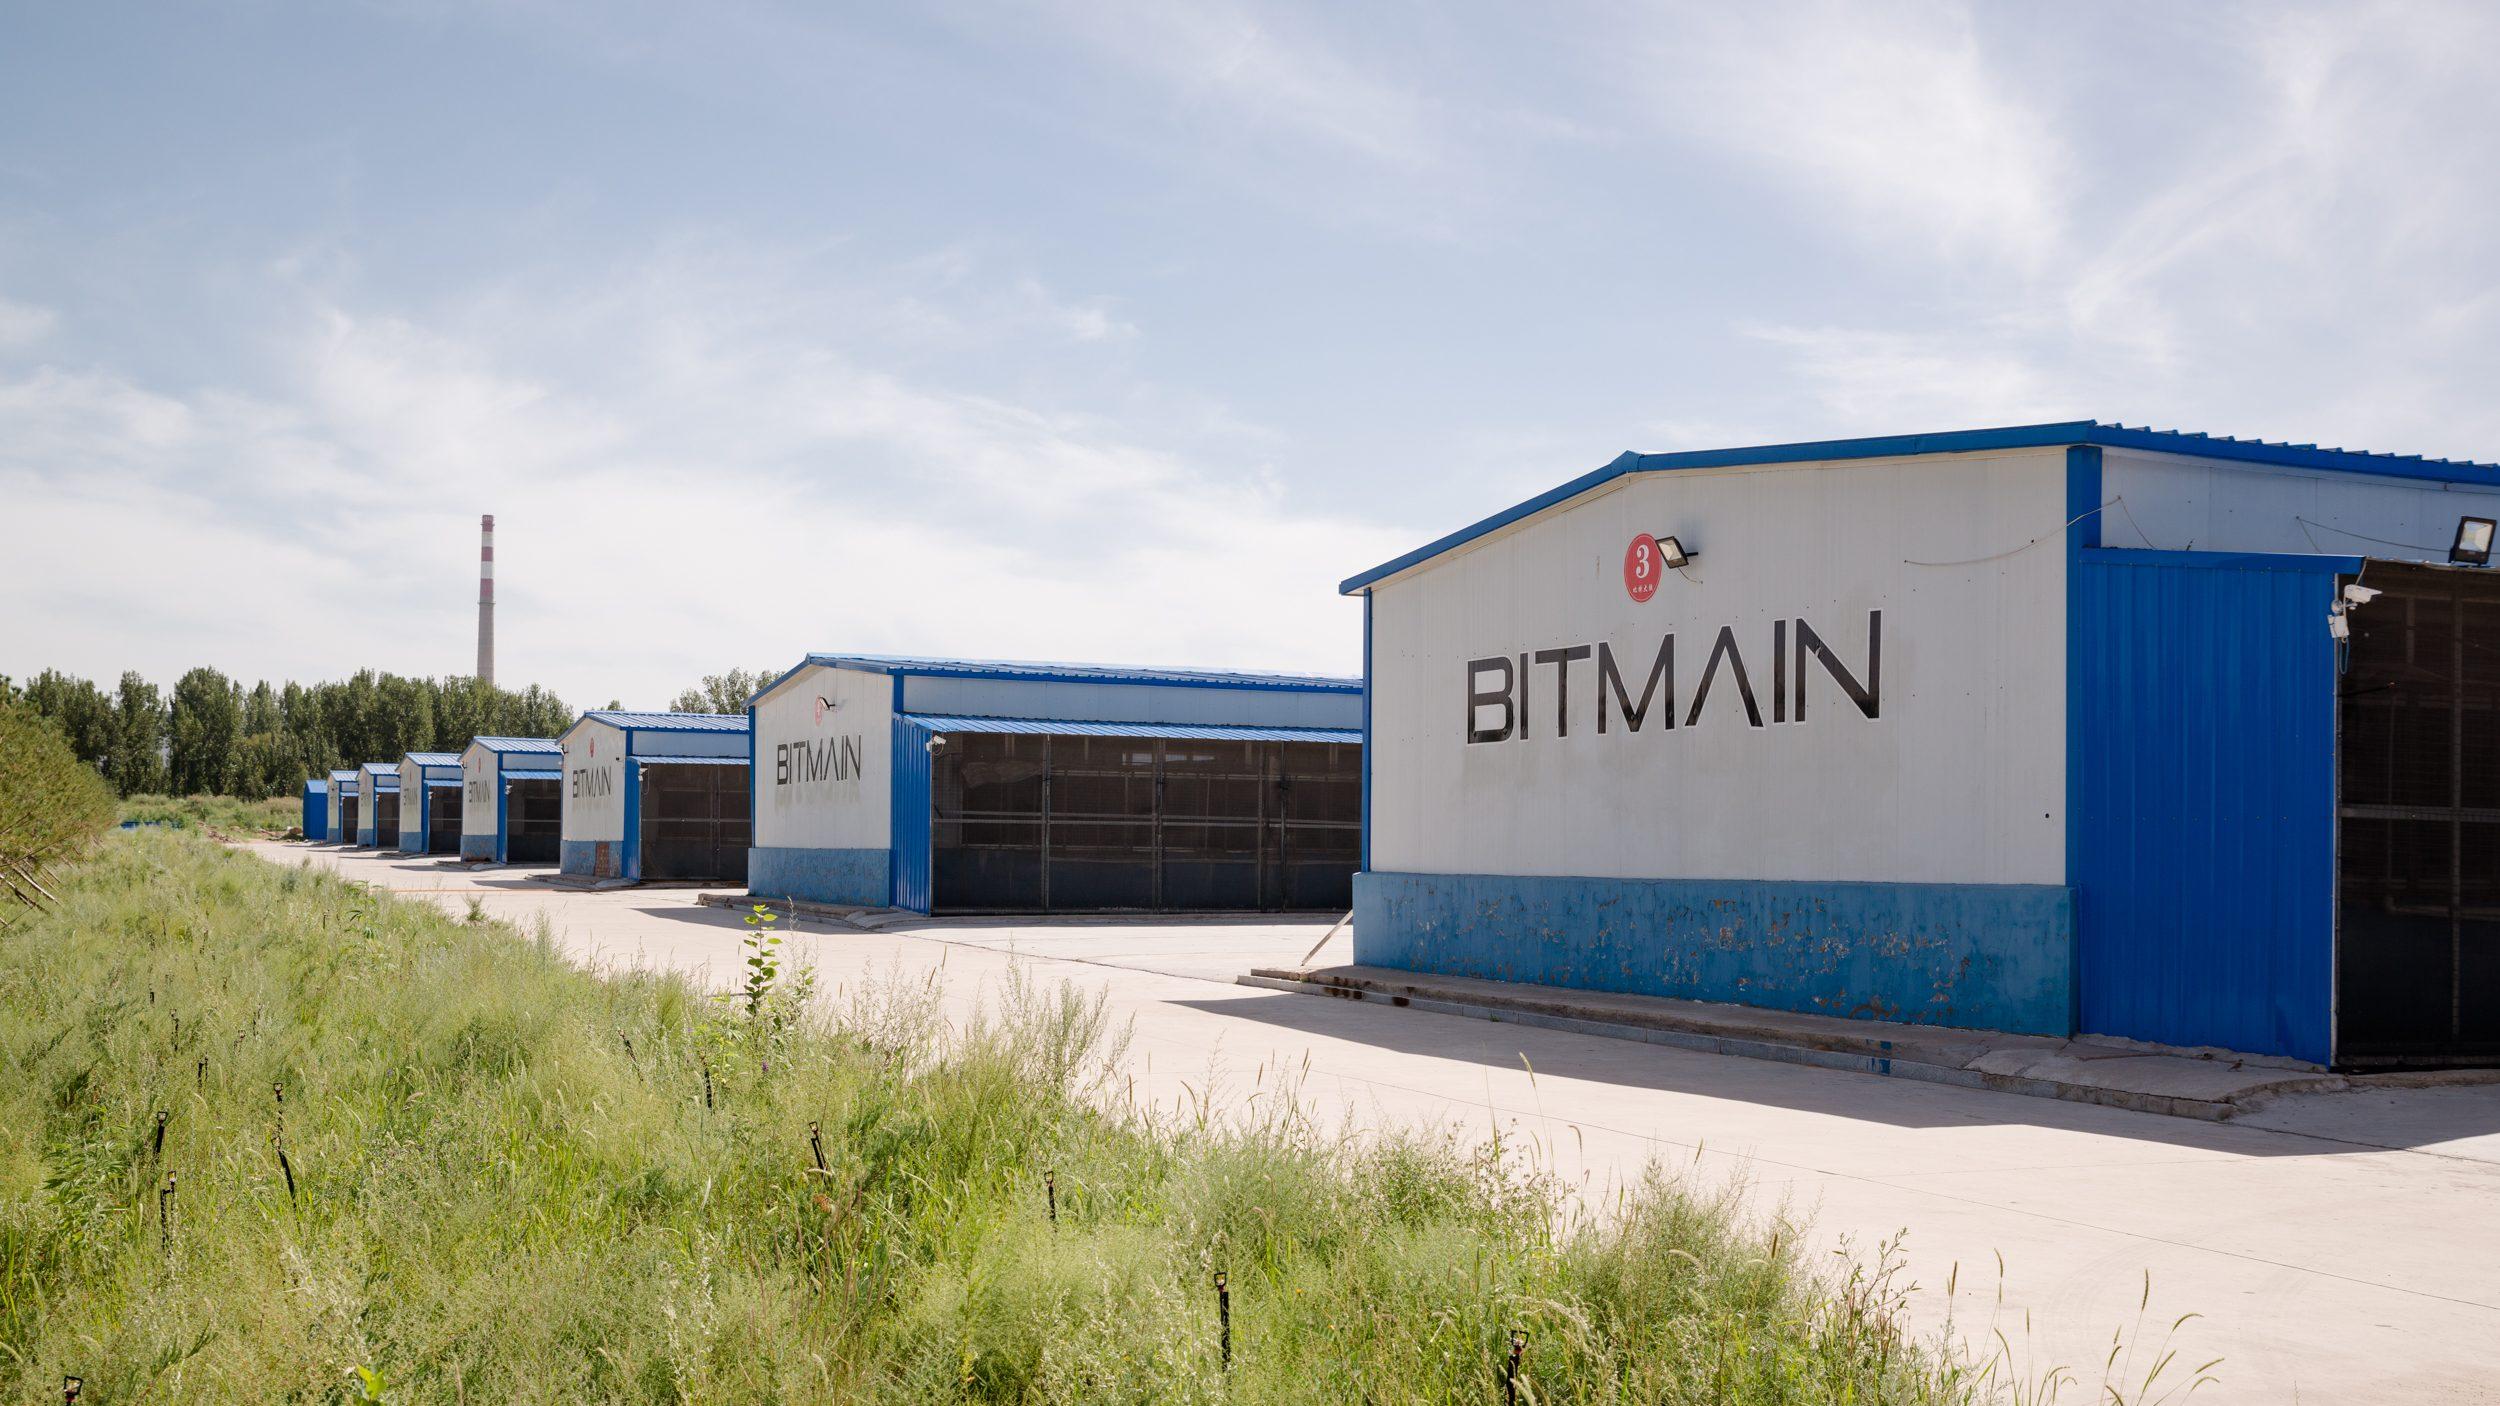 Bitmain's mine in Ordos, Inner Mongolia, China